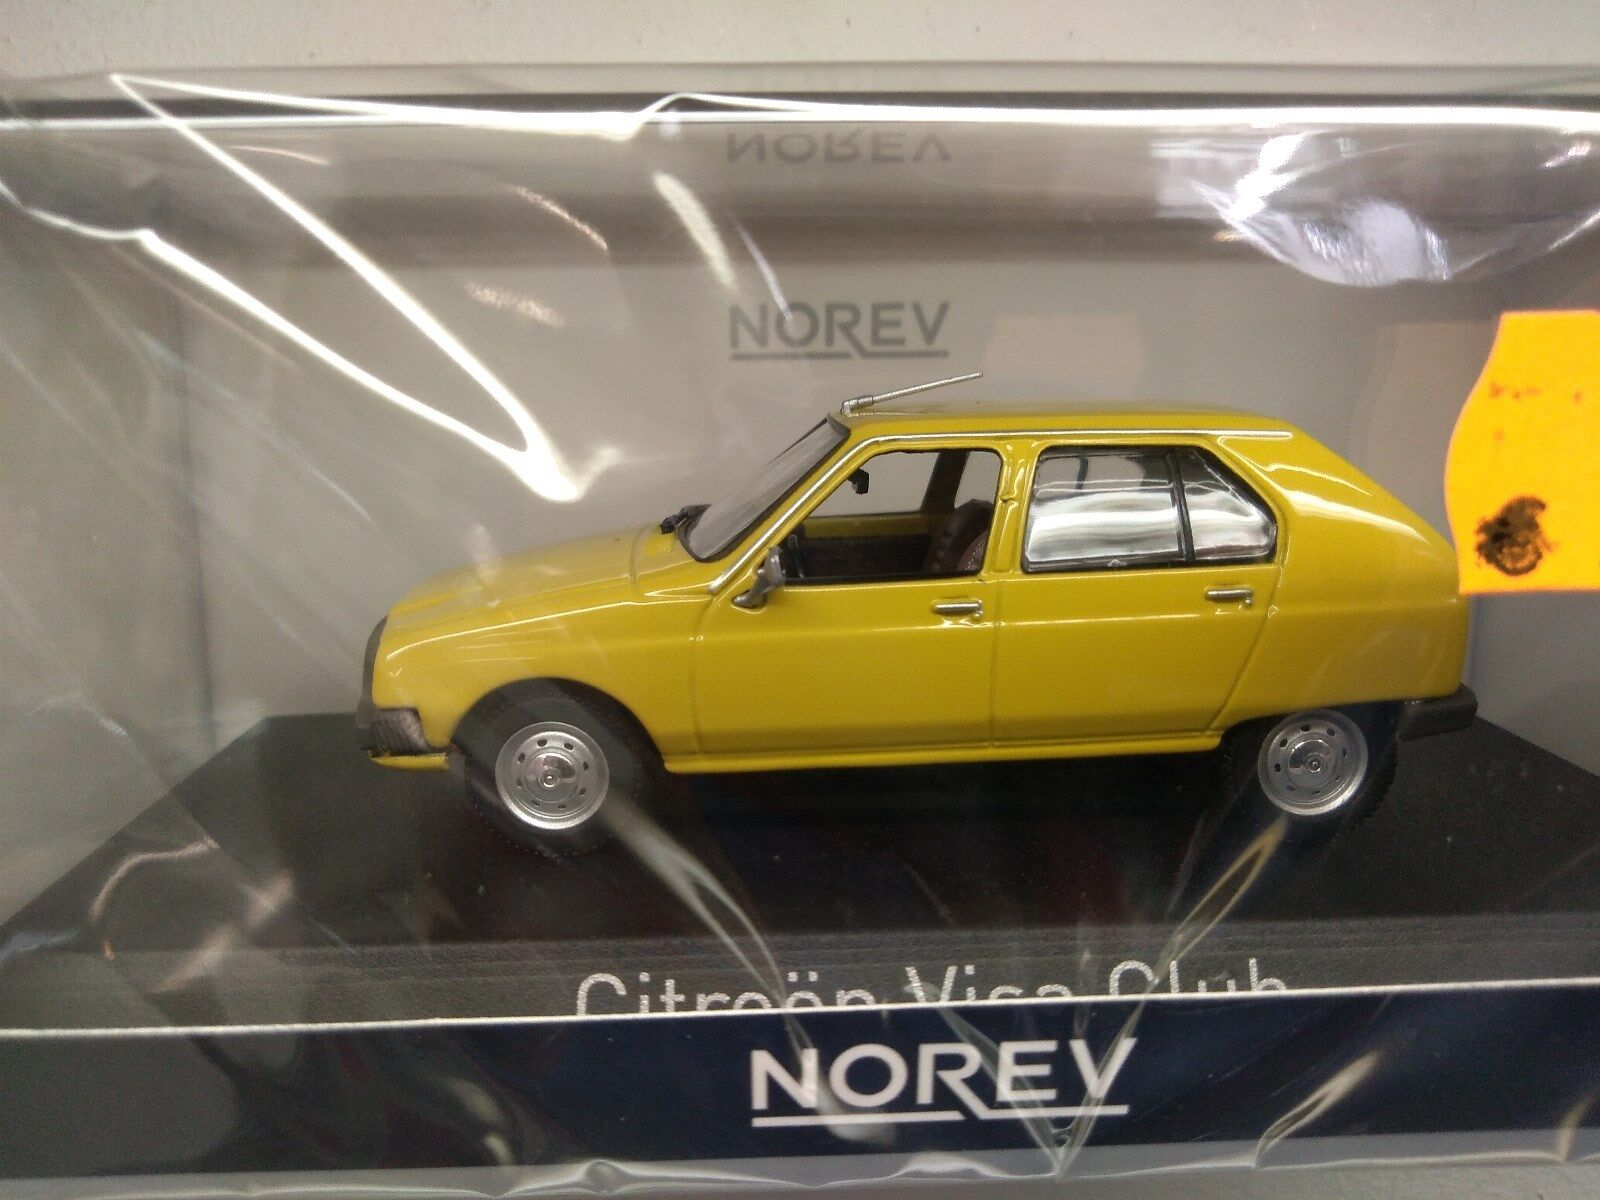 Miniature 1 43 Norev Citroên Visa club  1979 jaune